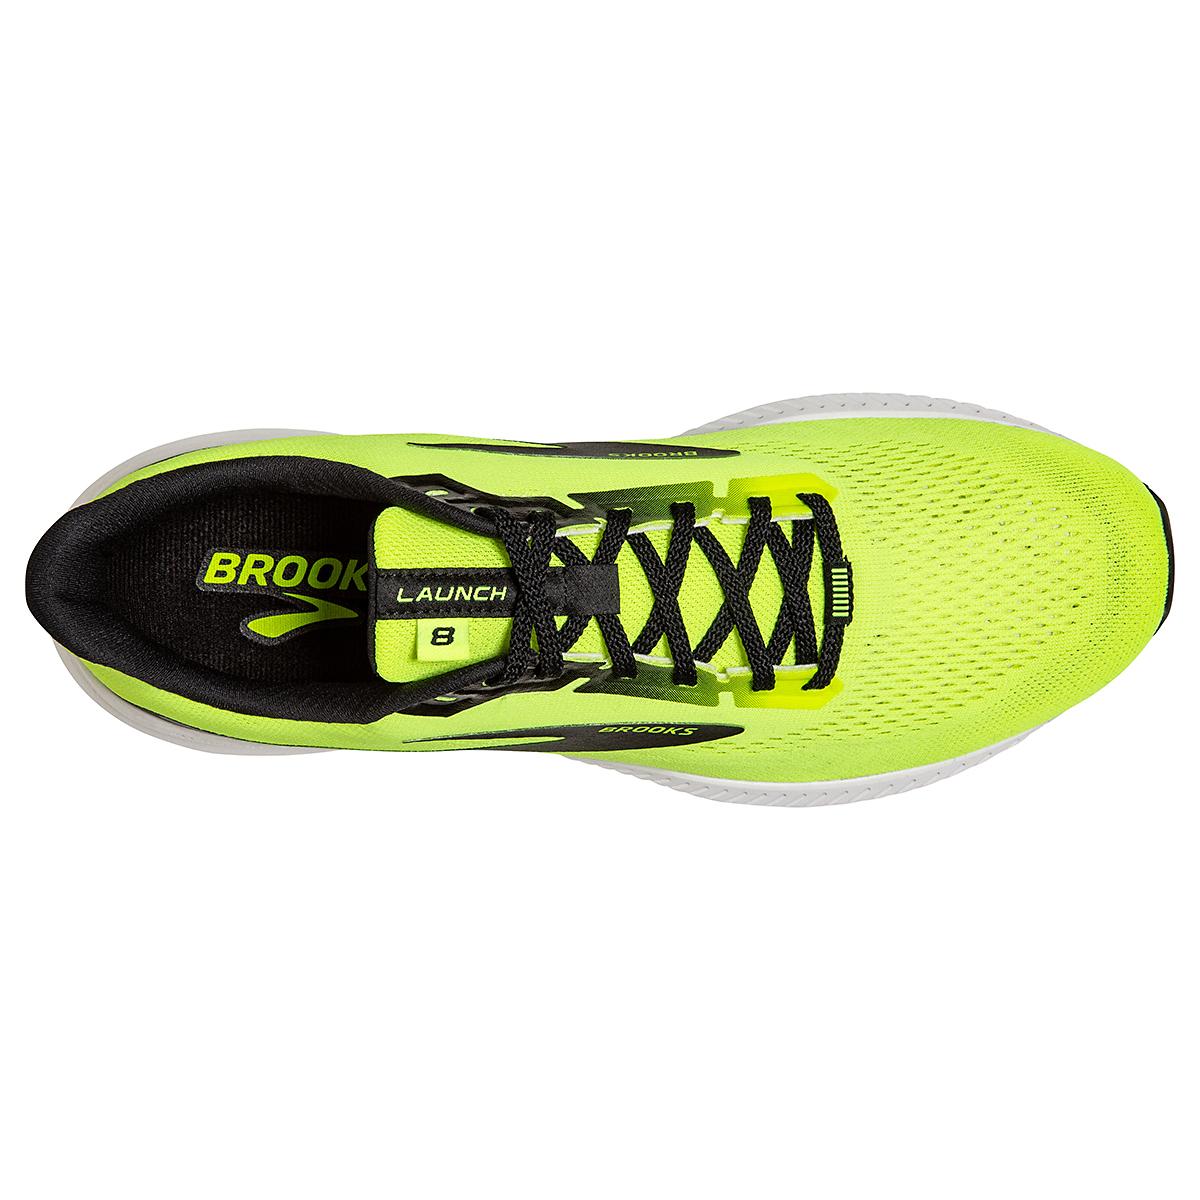 Men's Brooks Launch 8 Running Shoe - Color: Nightlife/Black/White - Size: 7 - Width: Regular, Nightlife/Black/White, large, image 5